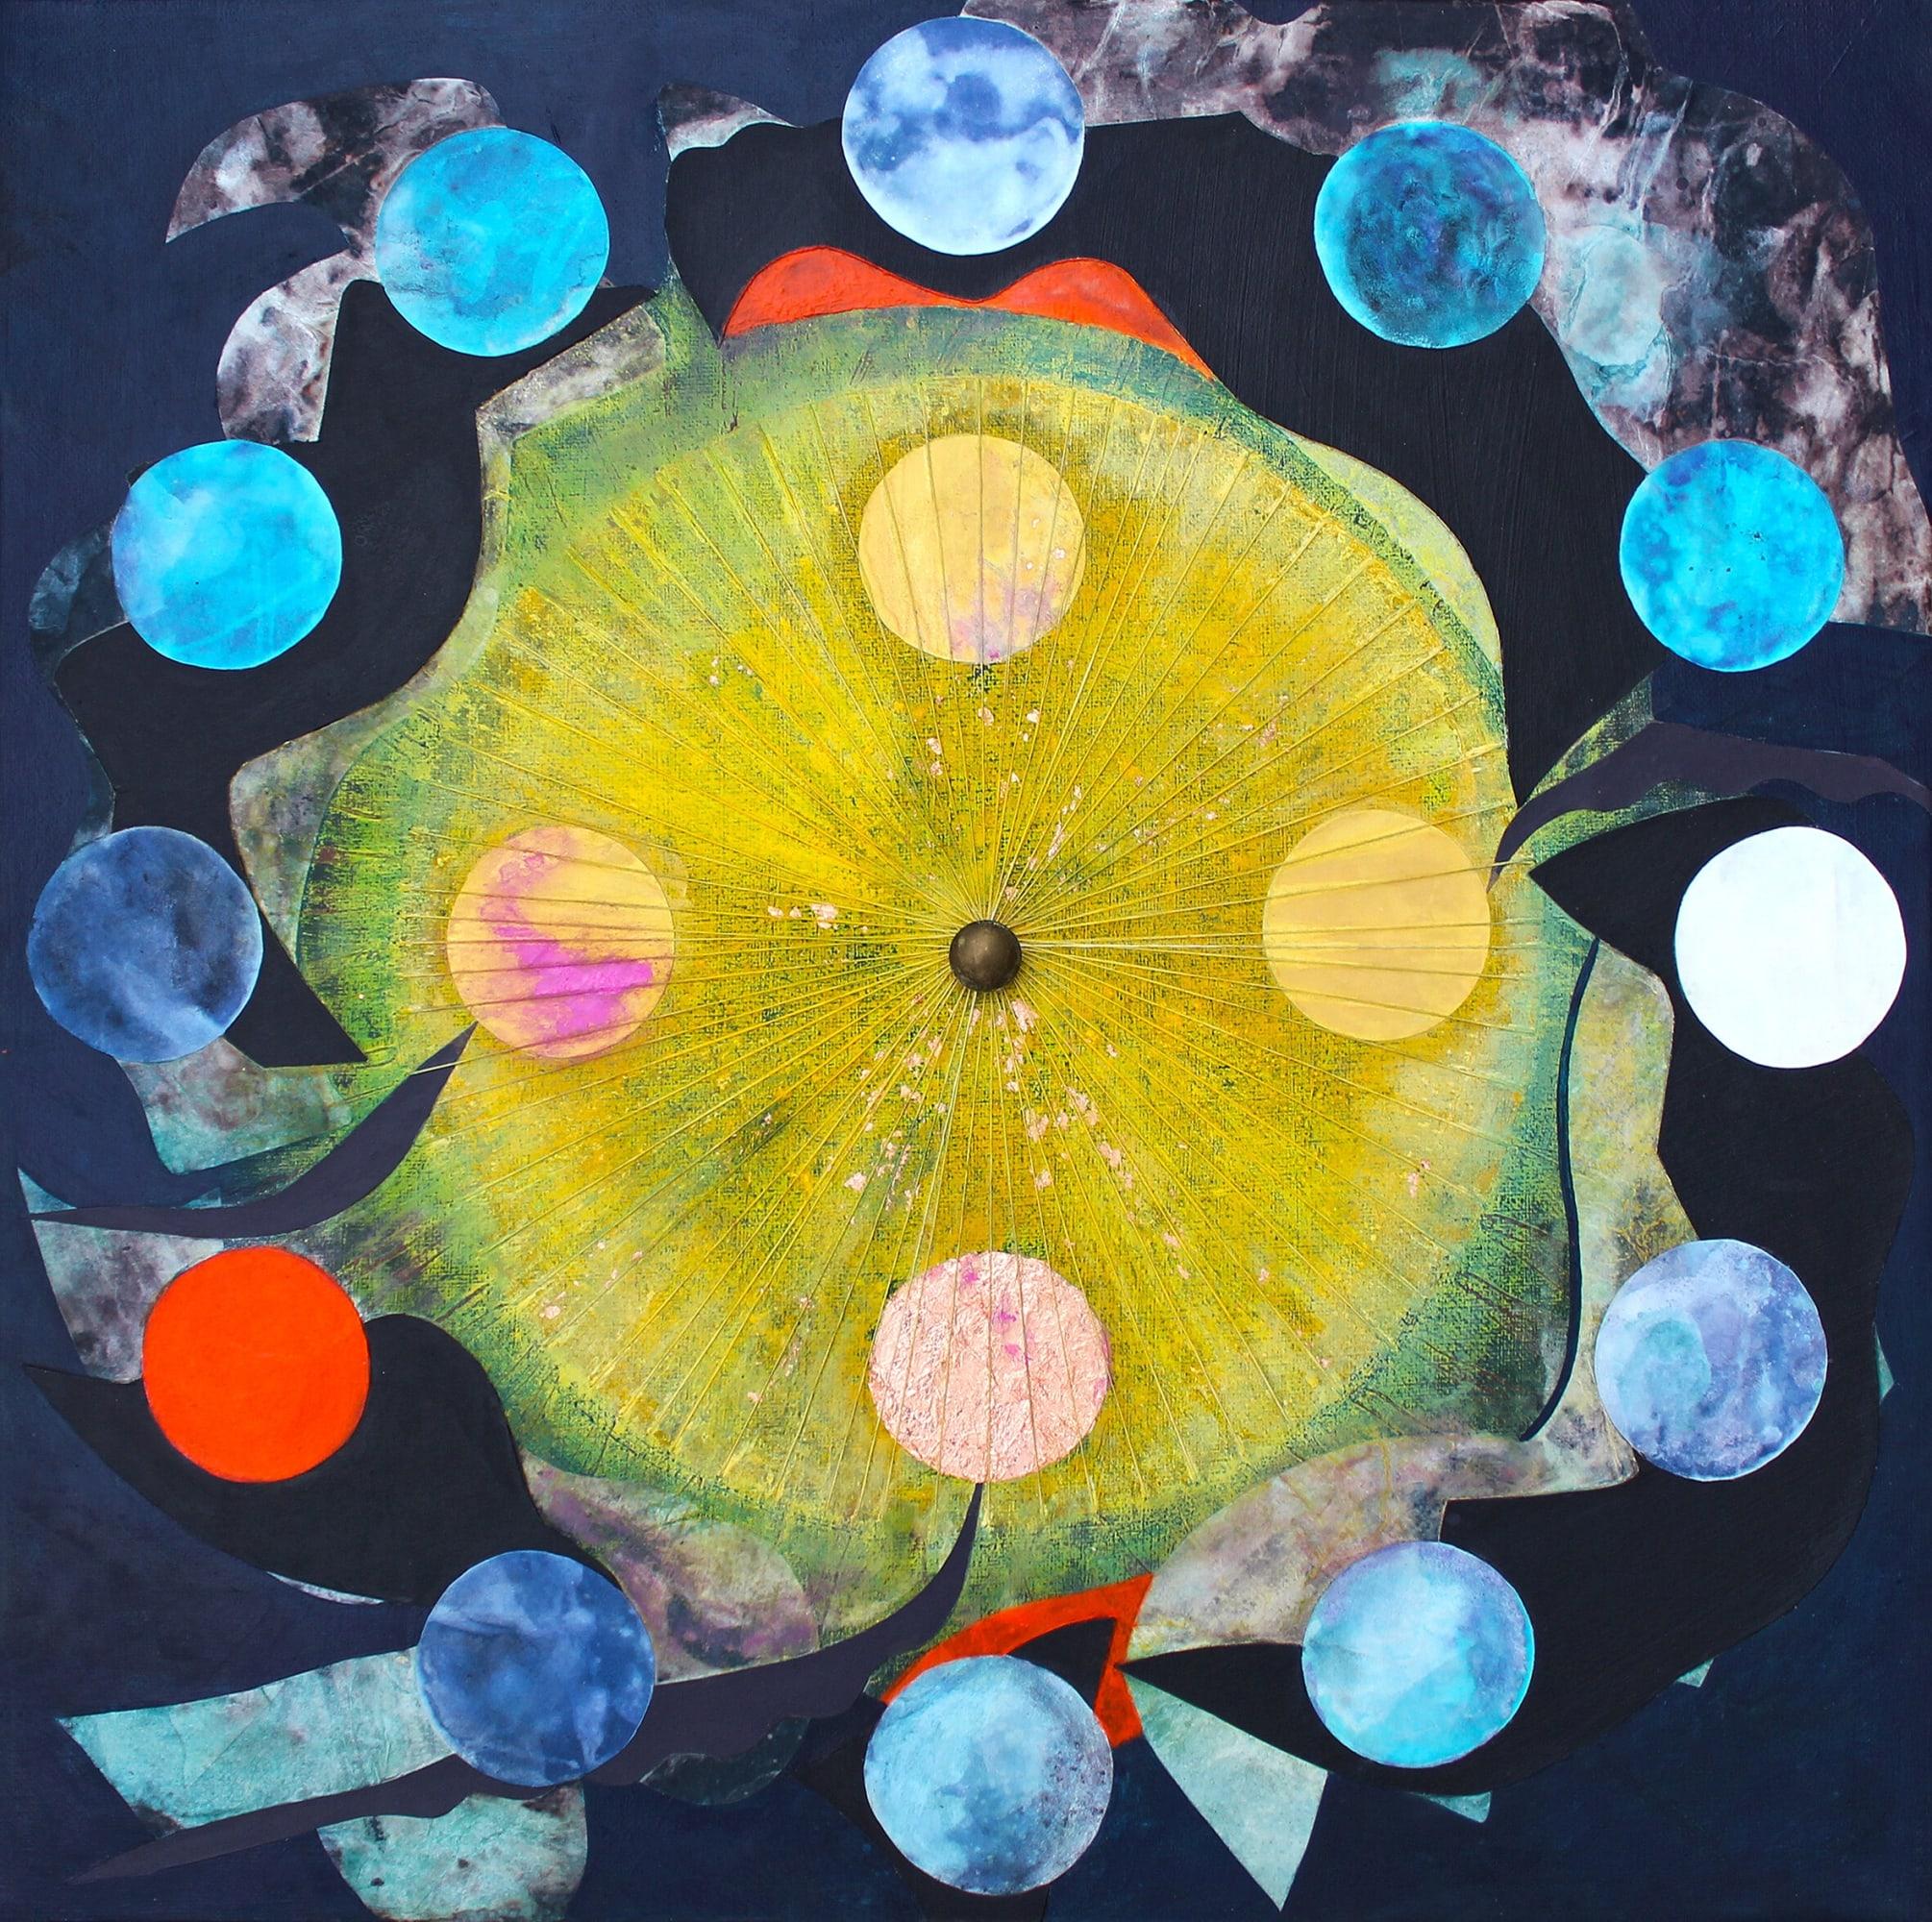 Tiffanie Delune - Seeds of Light